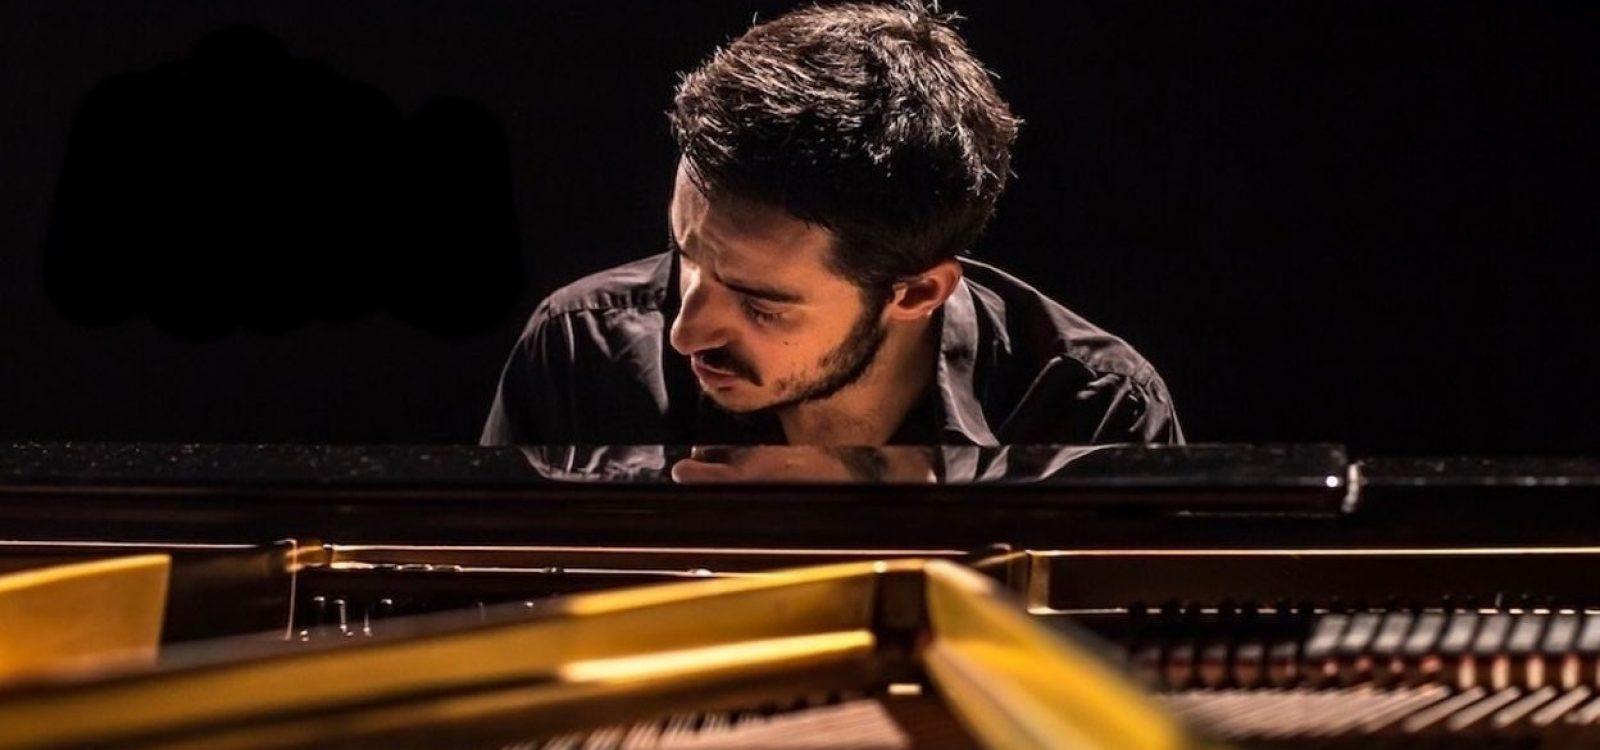 Jazz Maastricht x Lumìere Dorian Dumont APHE Xions 615ac532b8889